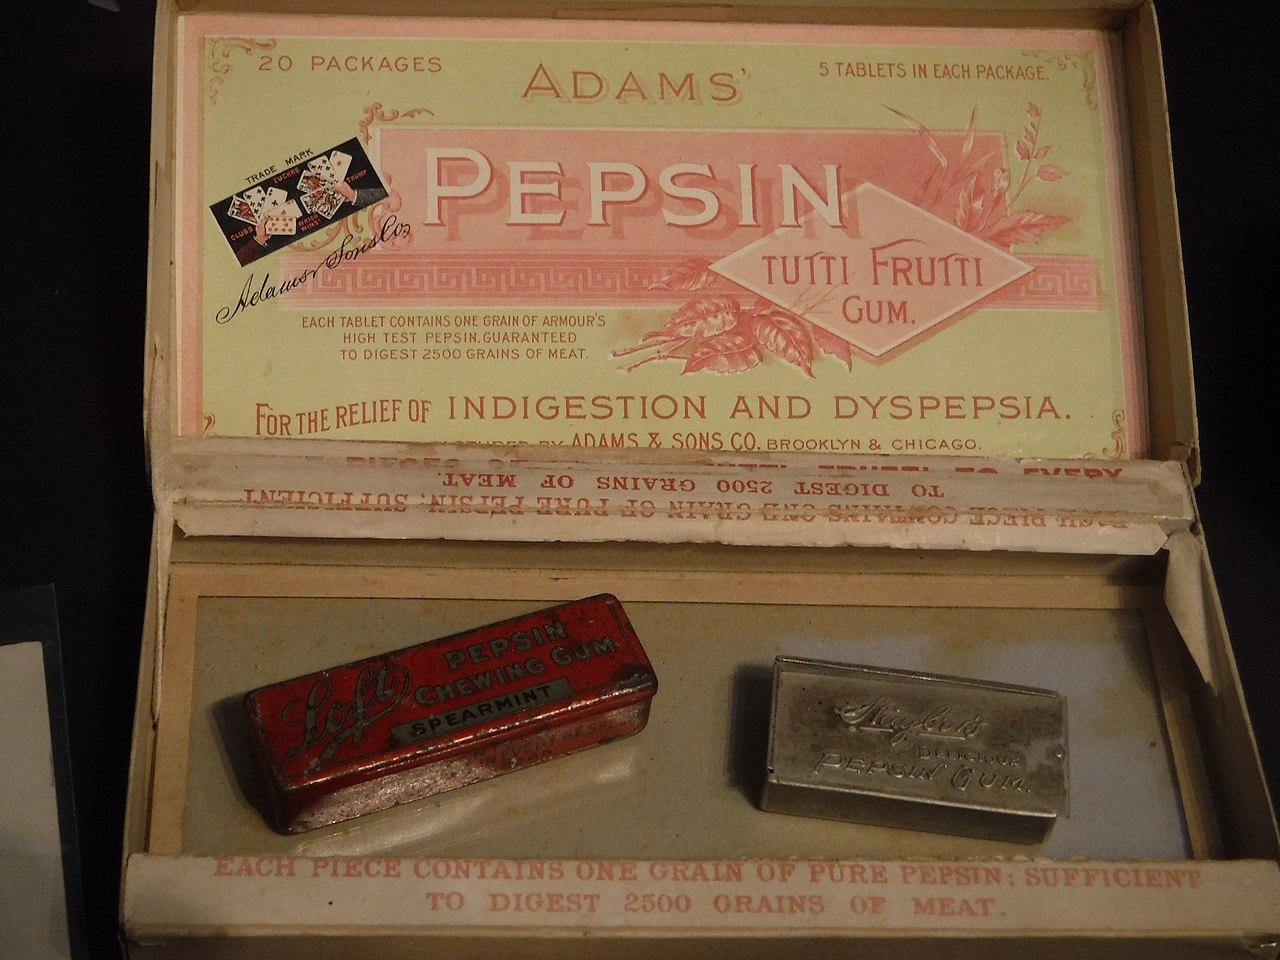 Modern-day chewing gum